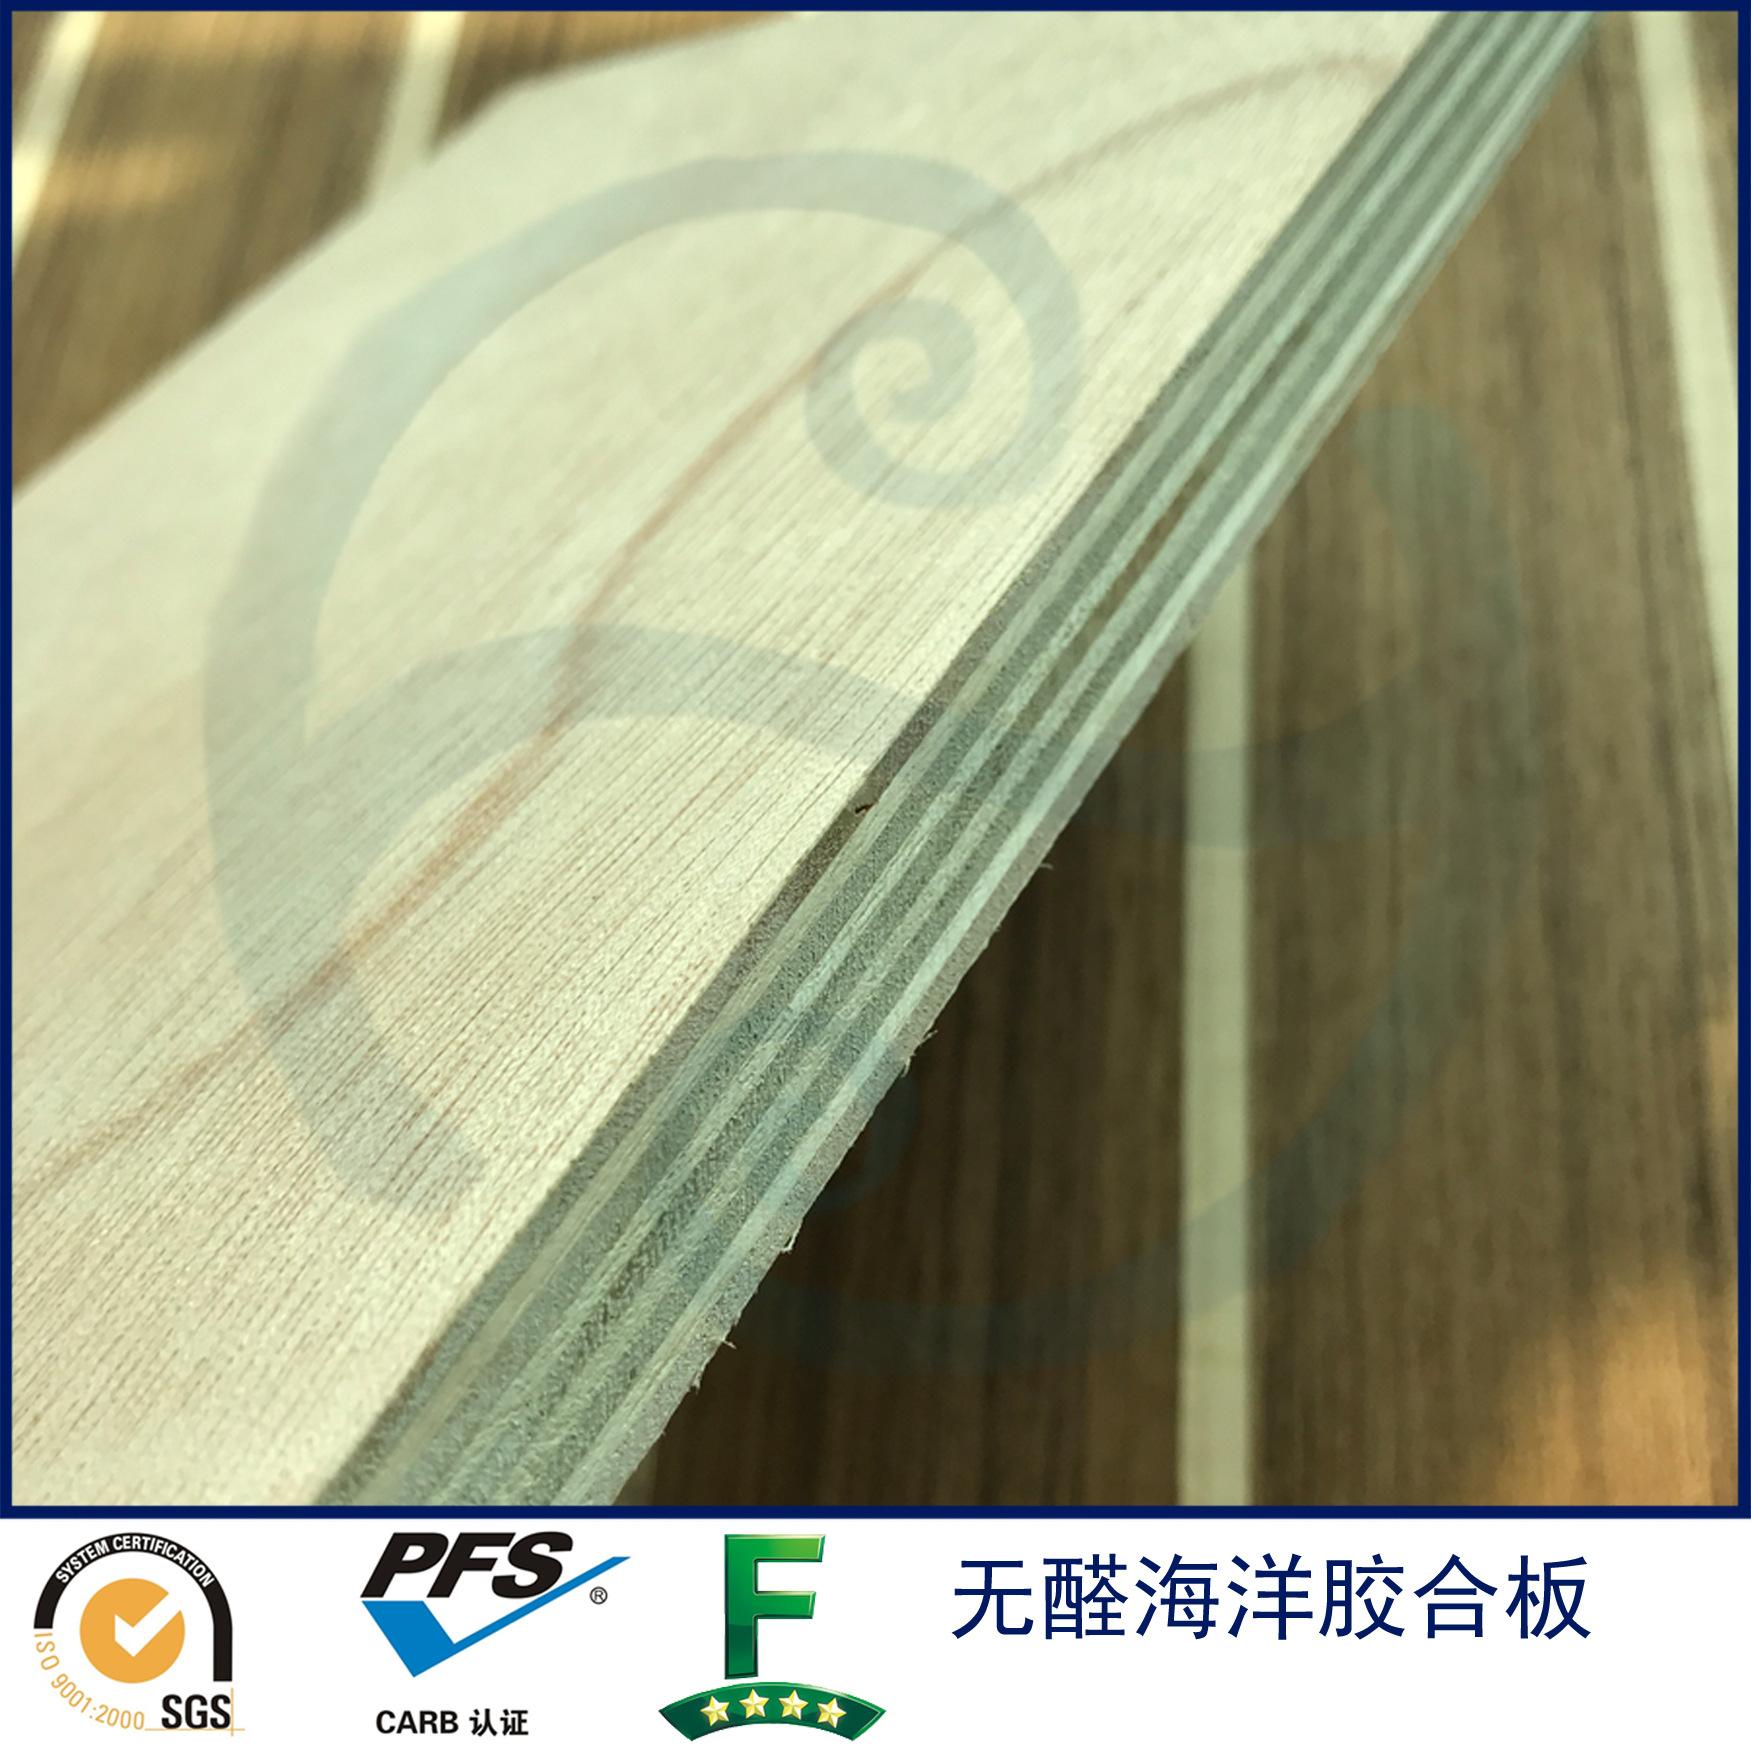 yellow pine kitchen cabinets target storage 【24-70 f4】_24-70 f4厂家_24-70 f4批发市场 - 阿里巴巴